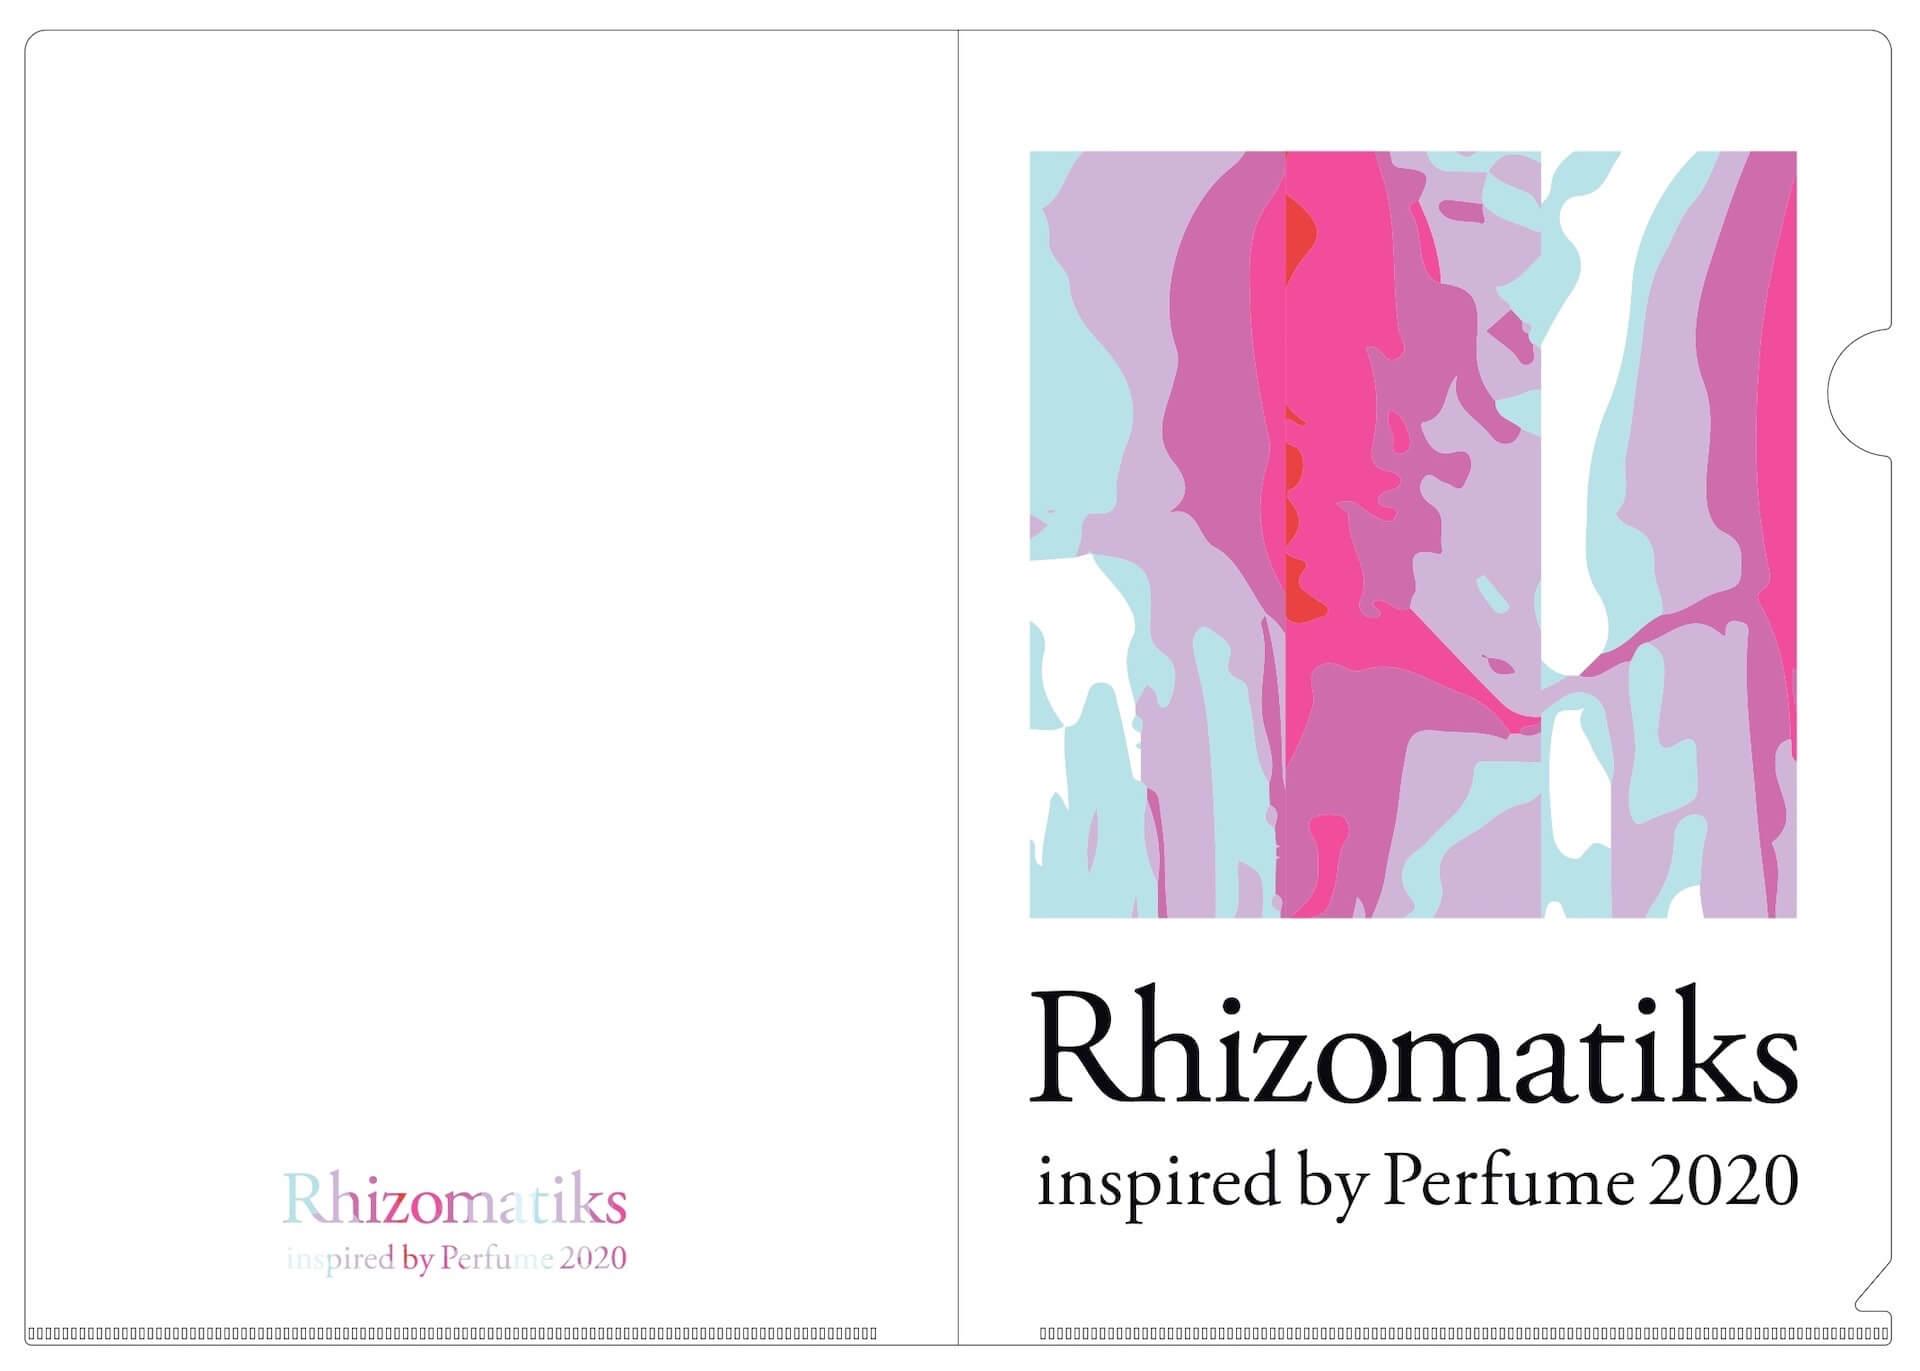 Perfume舞台演出の裏側を体験!<Rhizomatiks inspired by Perfume 2020>が渋谷PARCO MUSEUMで開催! ac200109_rhizomatiksparco_05